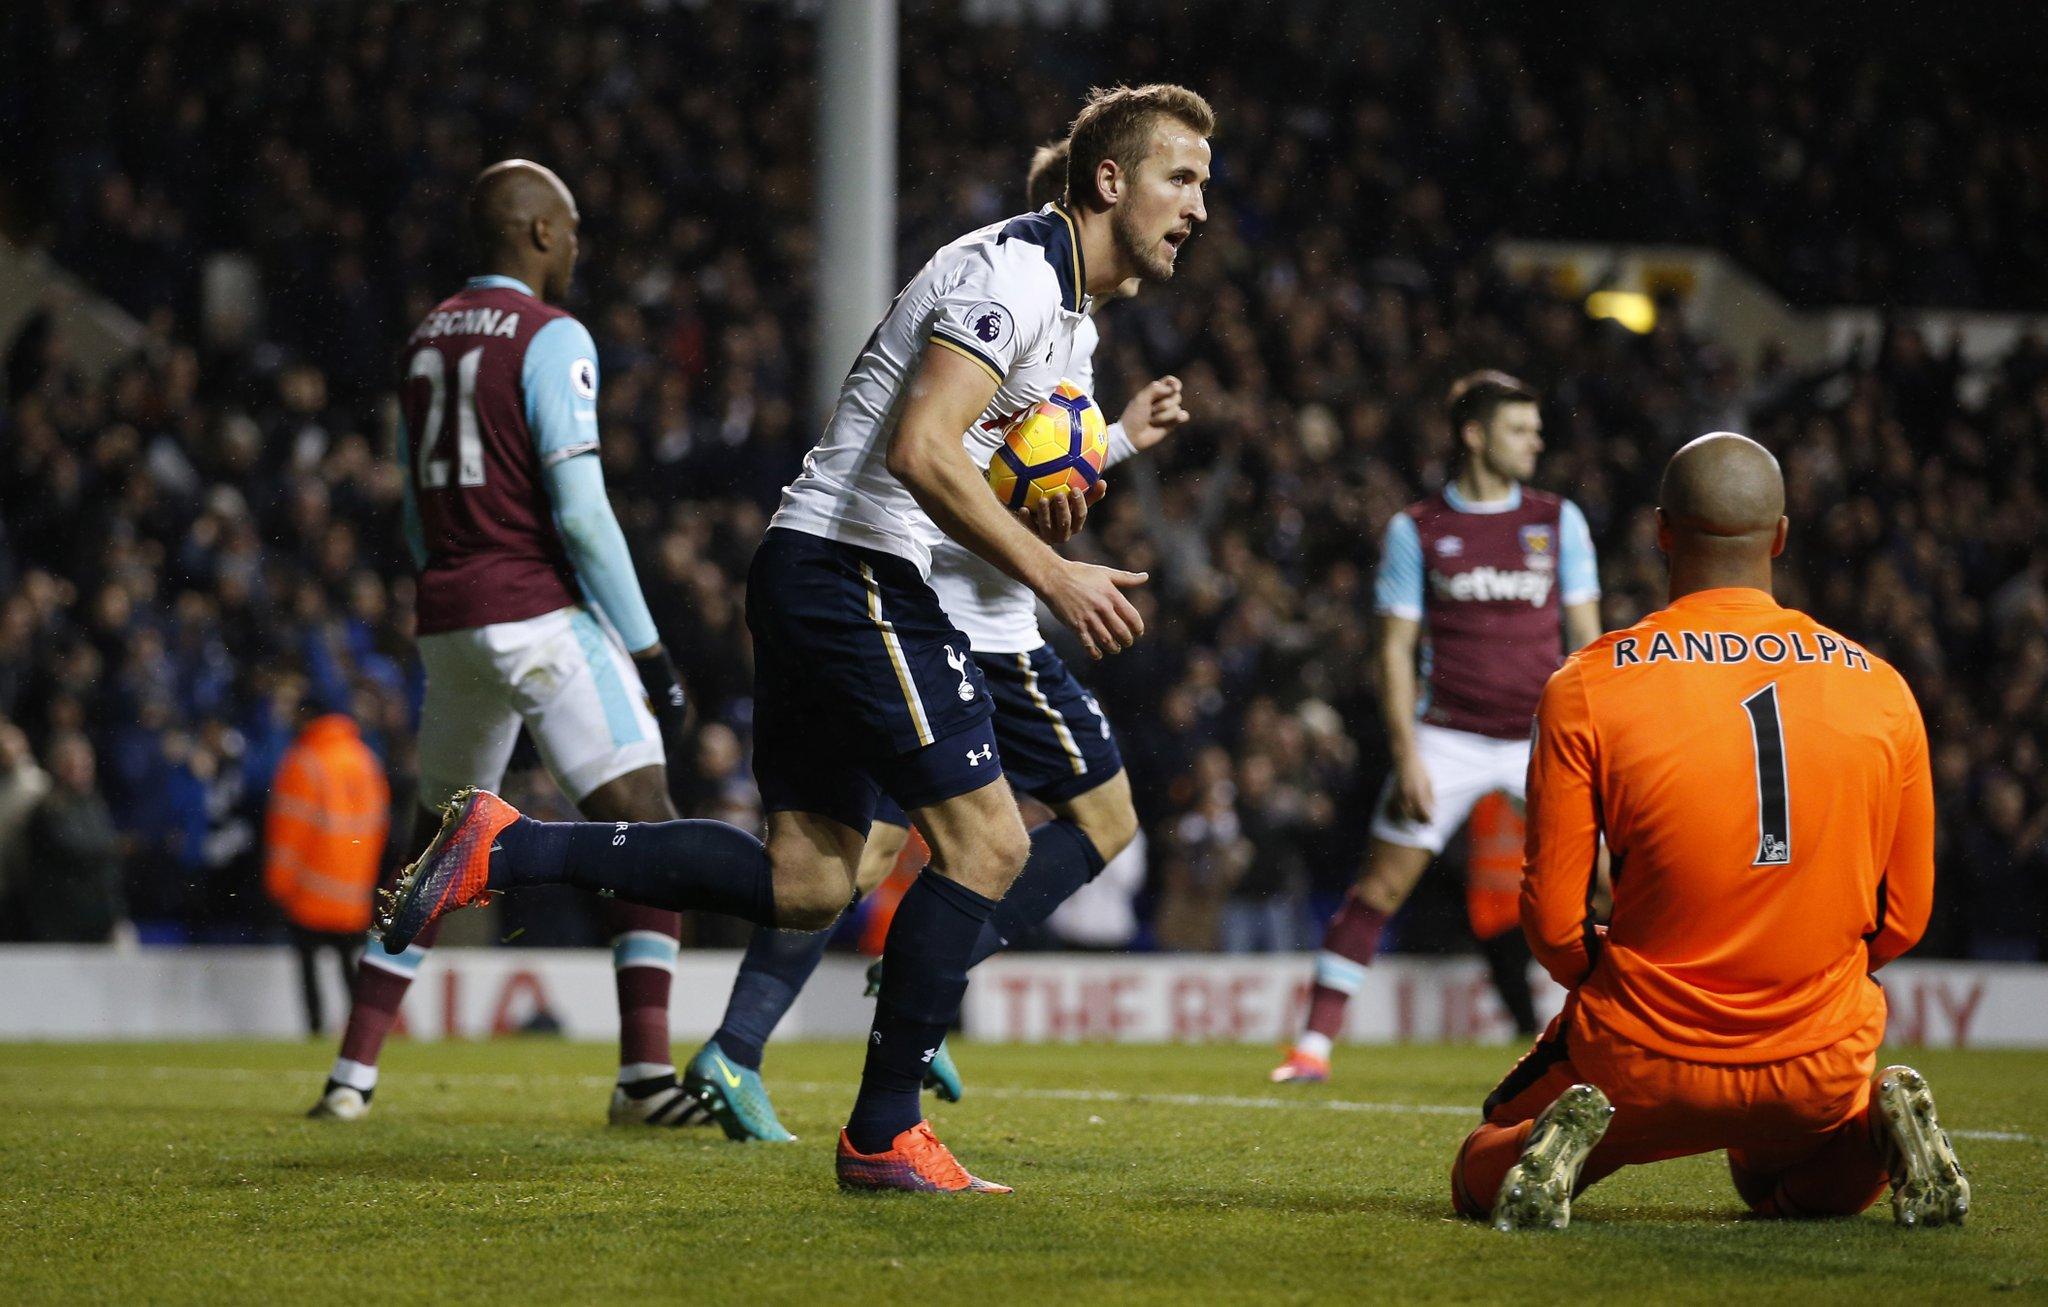 Kane Fires Late Brace As Tottenham Outscore West Ham